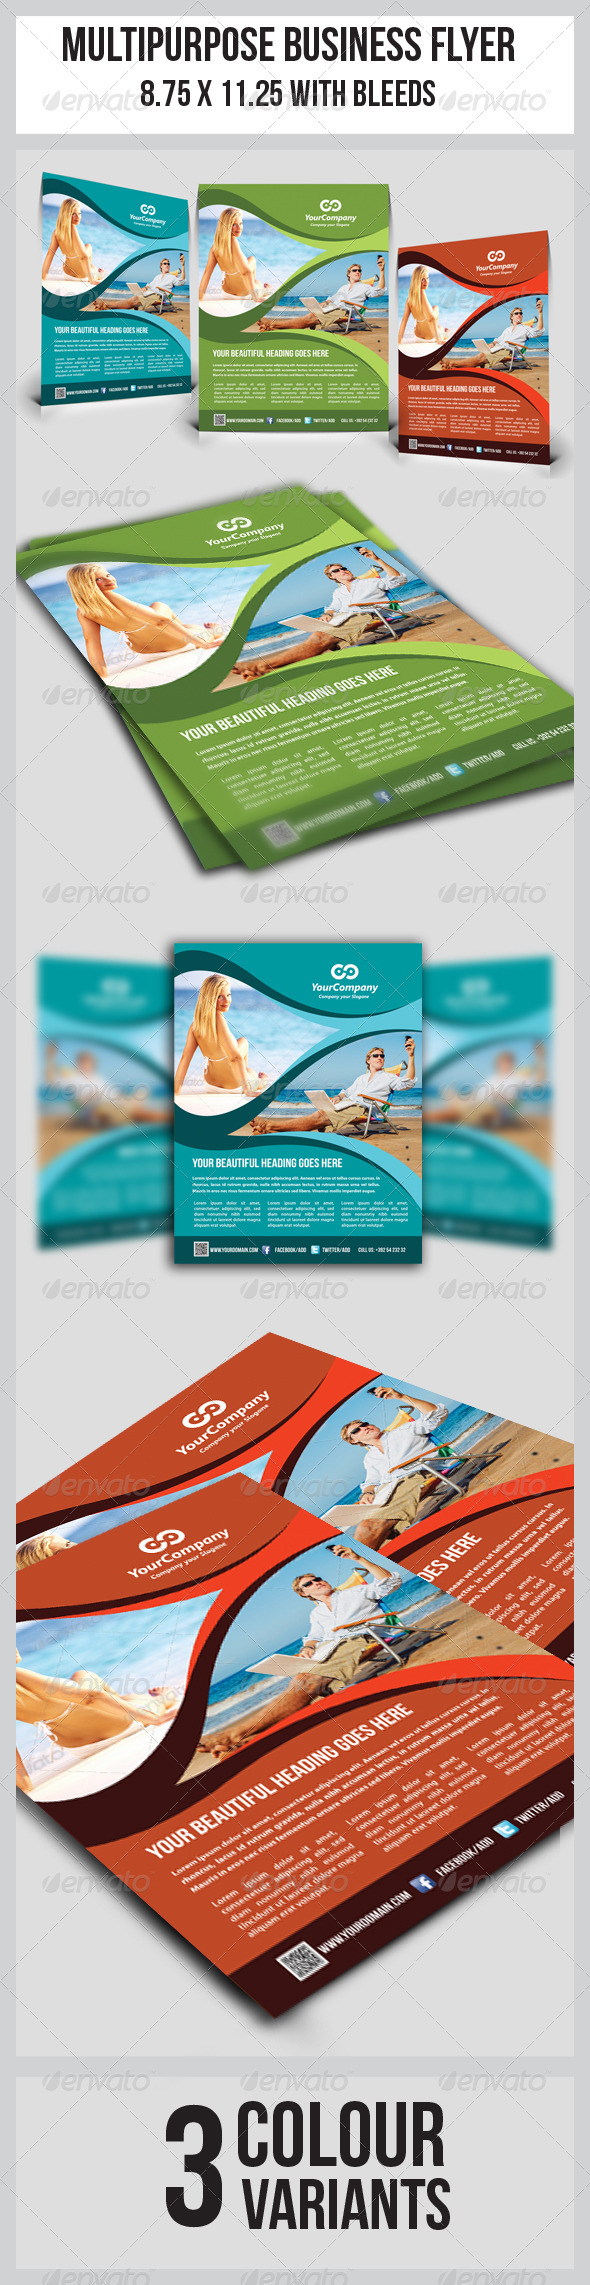 Tourism Flyer Vol.1 - Corporate Flyers